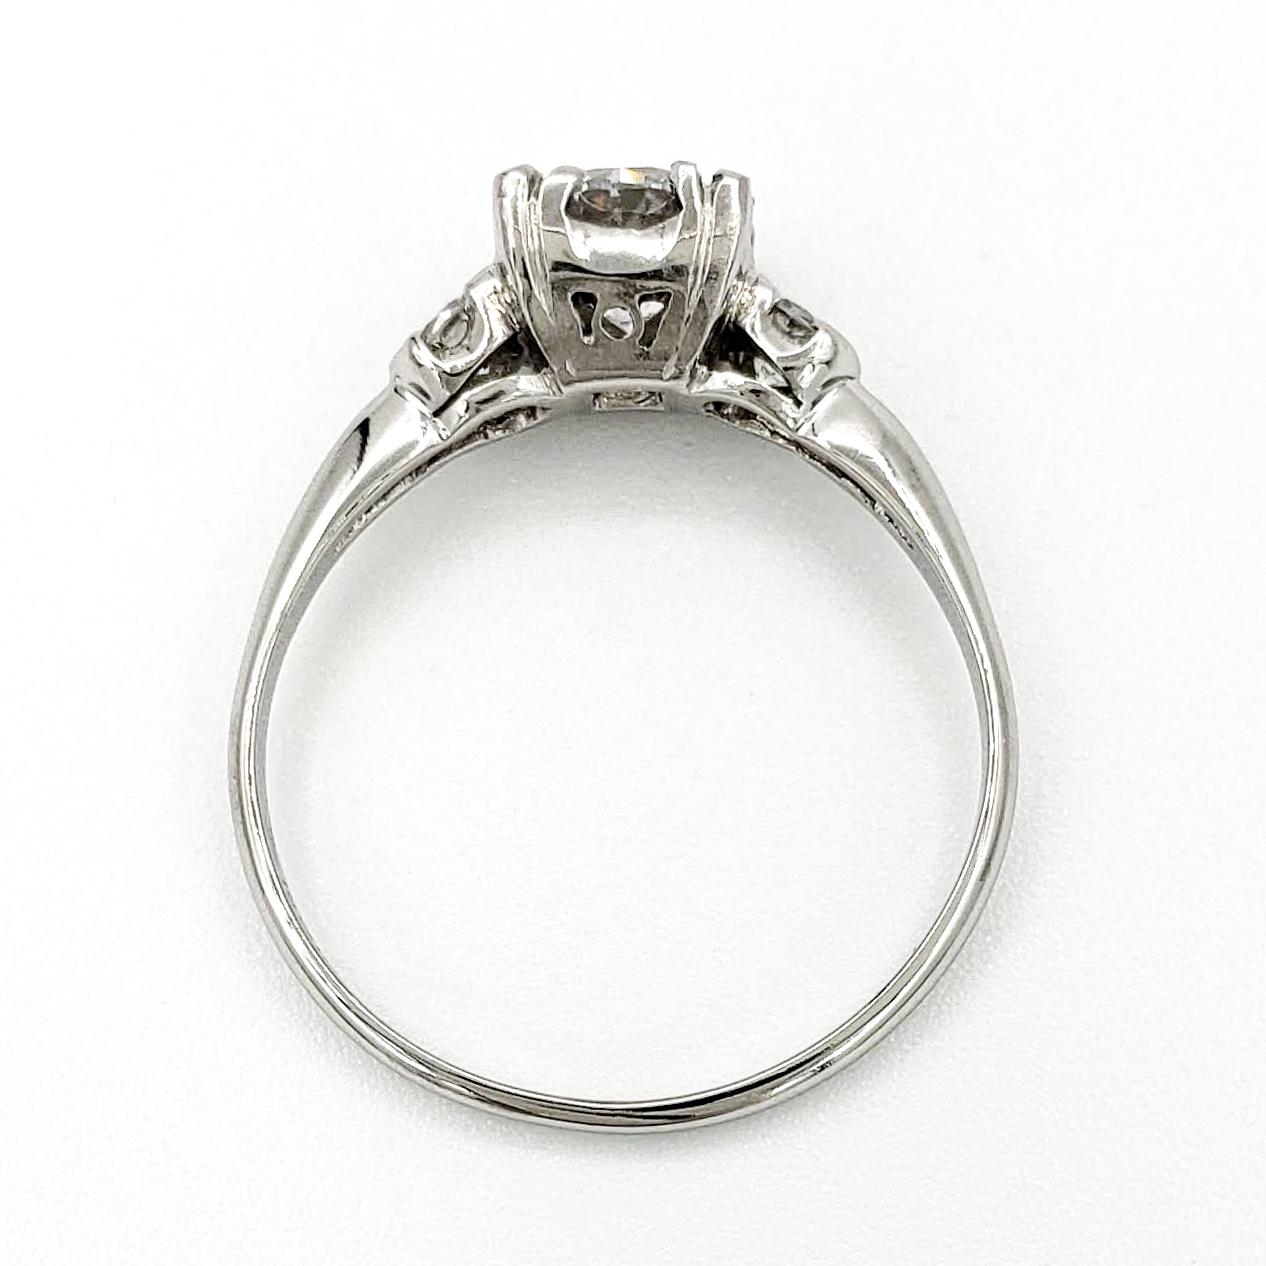 vintage-platinum-engagement-ring-with-0-70-carat-round-brilliant-cut-diamond-gia-d-if